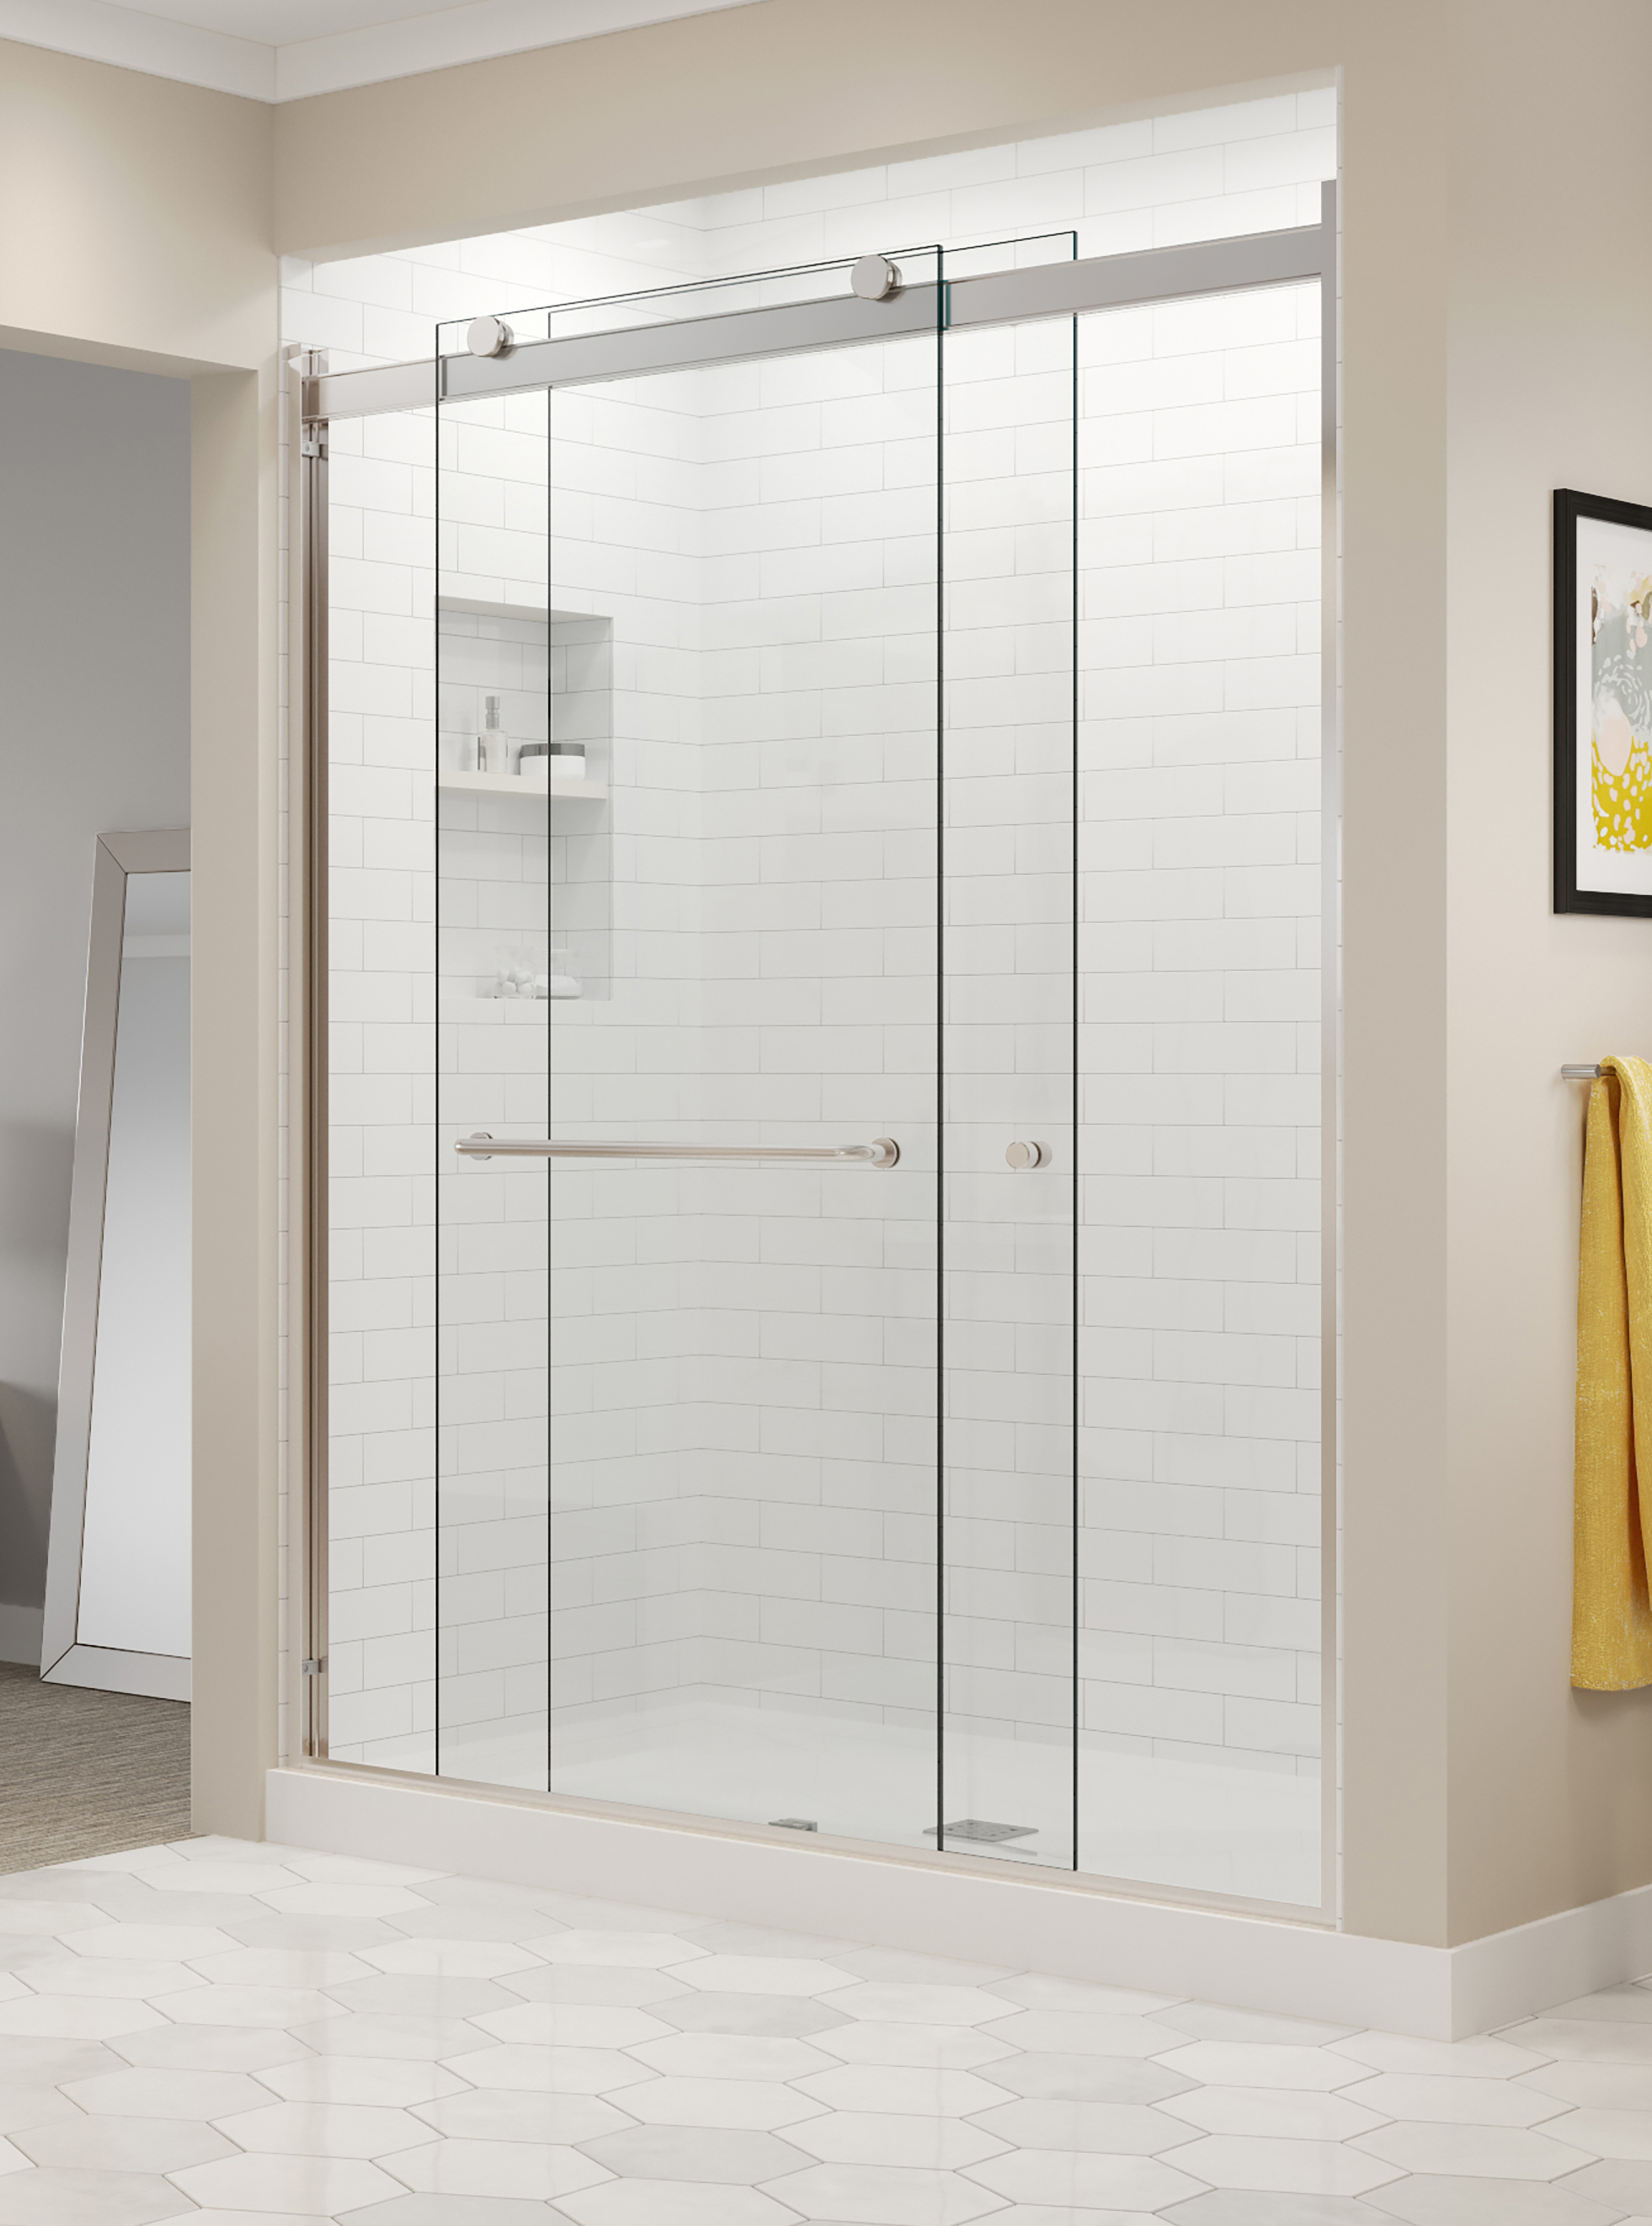 Acrylic Fiberglass Guide Basco Shower Doors